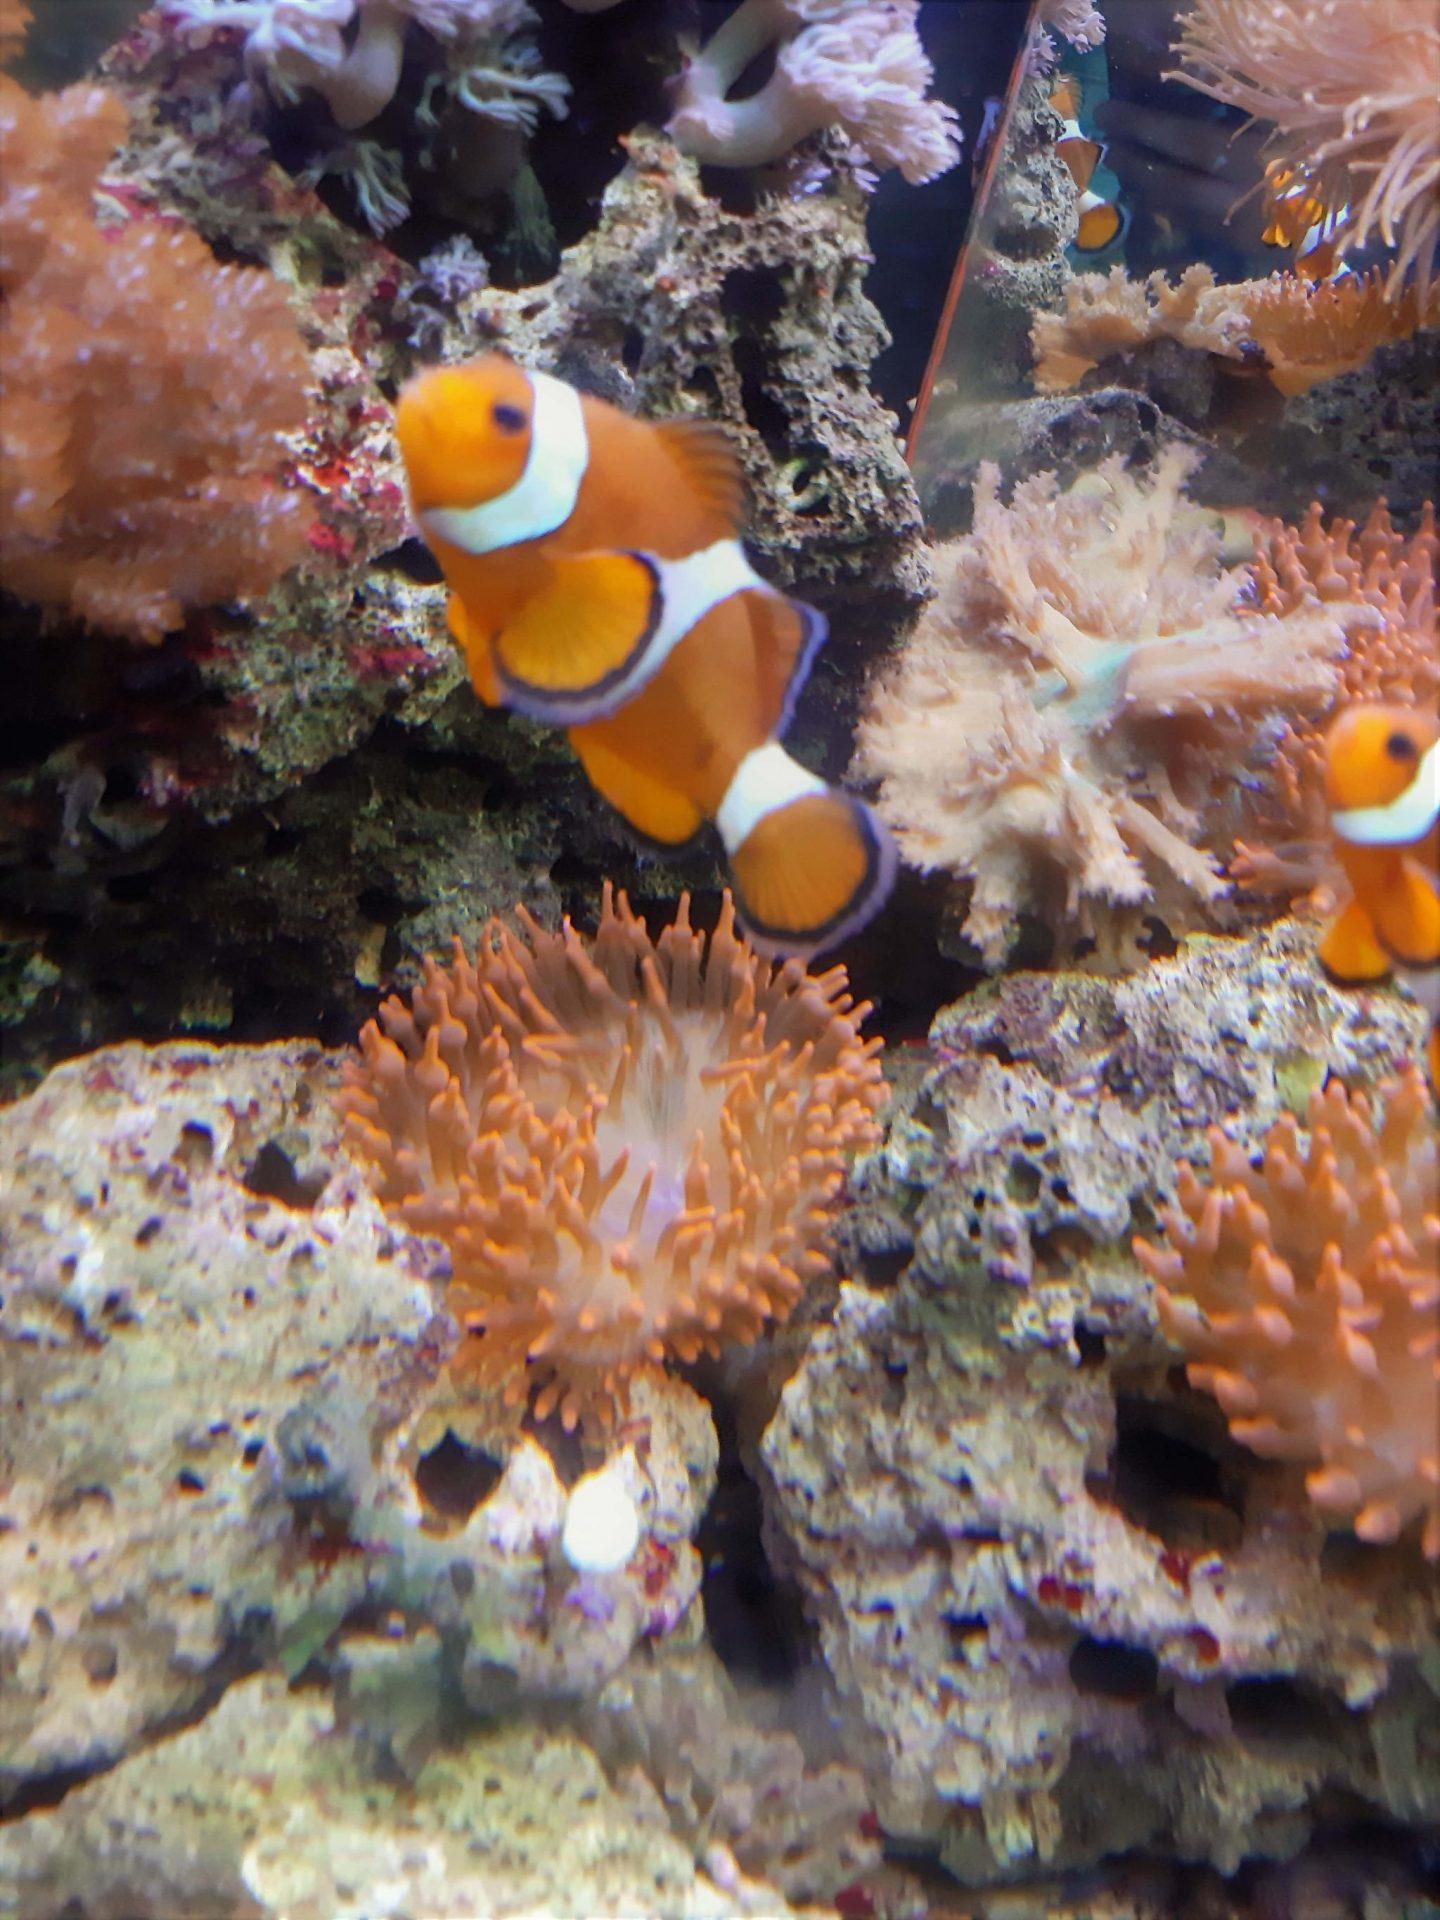 Riba klovn - Nemo © According to Kristina